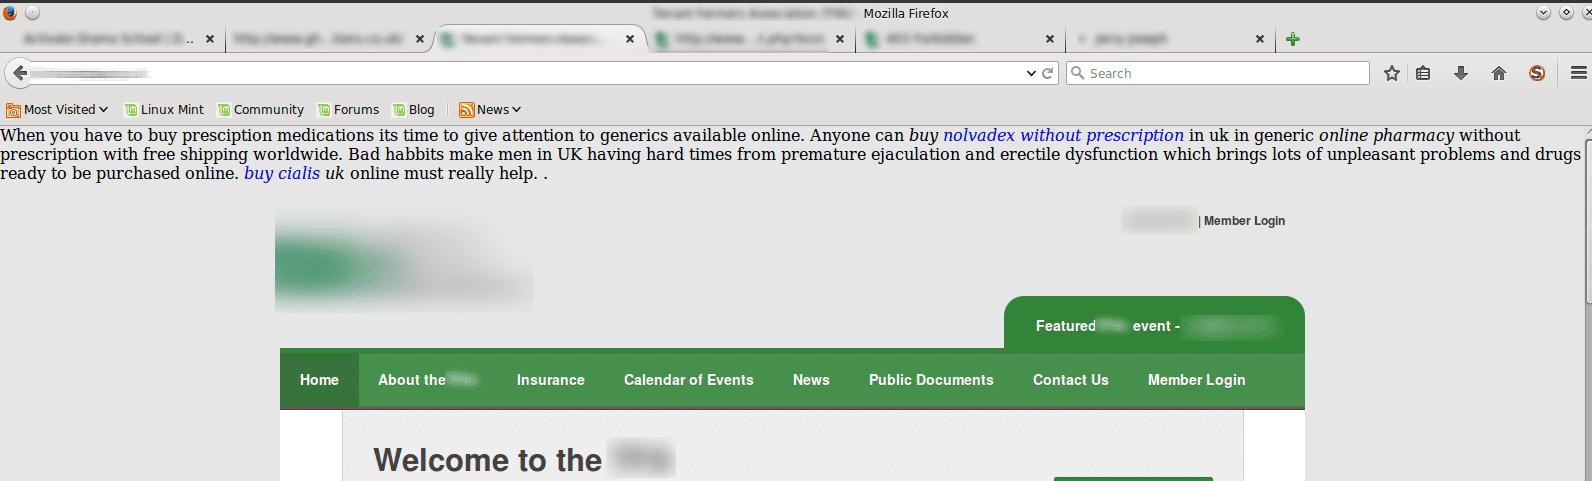 Googlebot User Agent-showing hidden Mobile-Shortcuts SEO spam